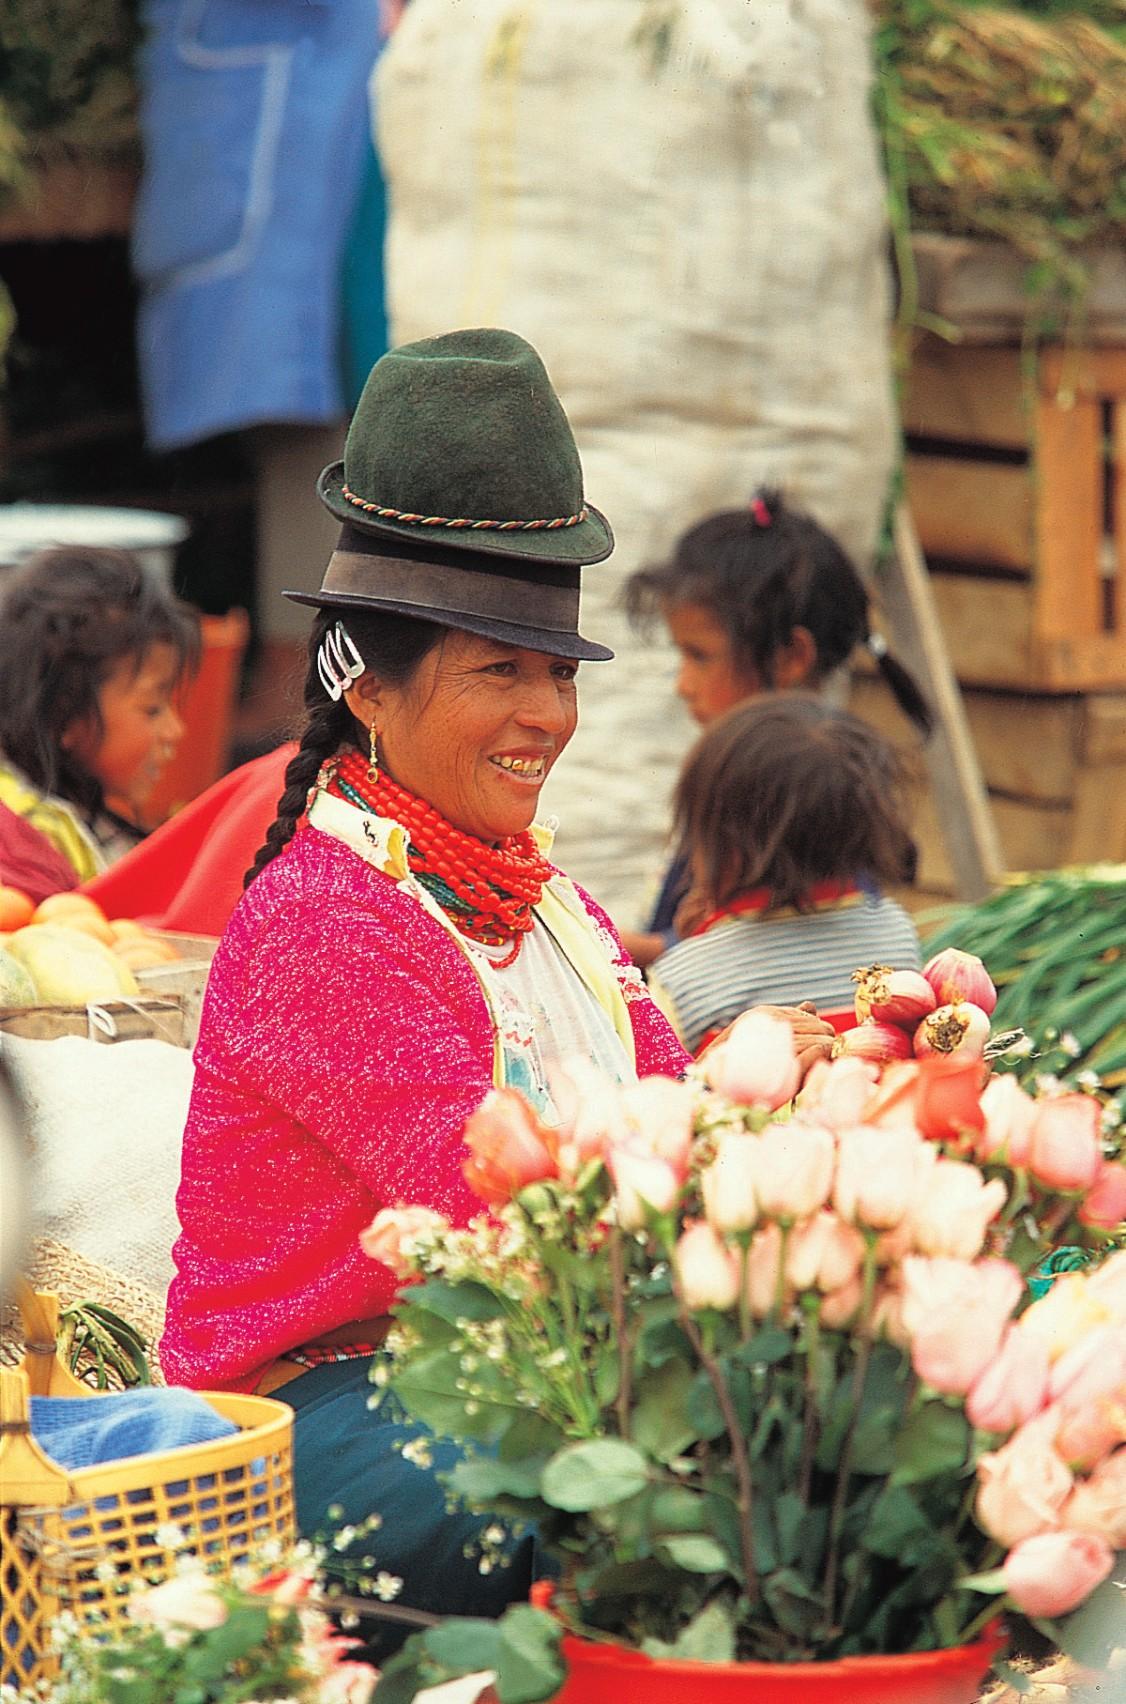 ecu06-visit-a-traditional-andean-market-free-metro